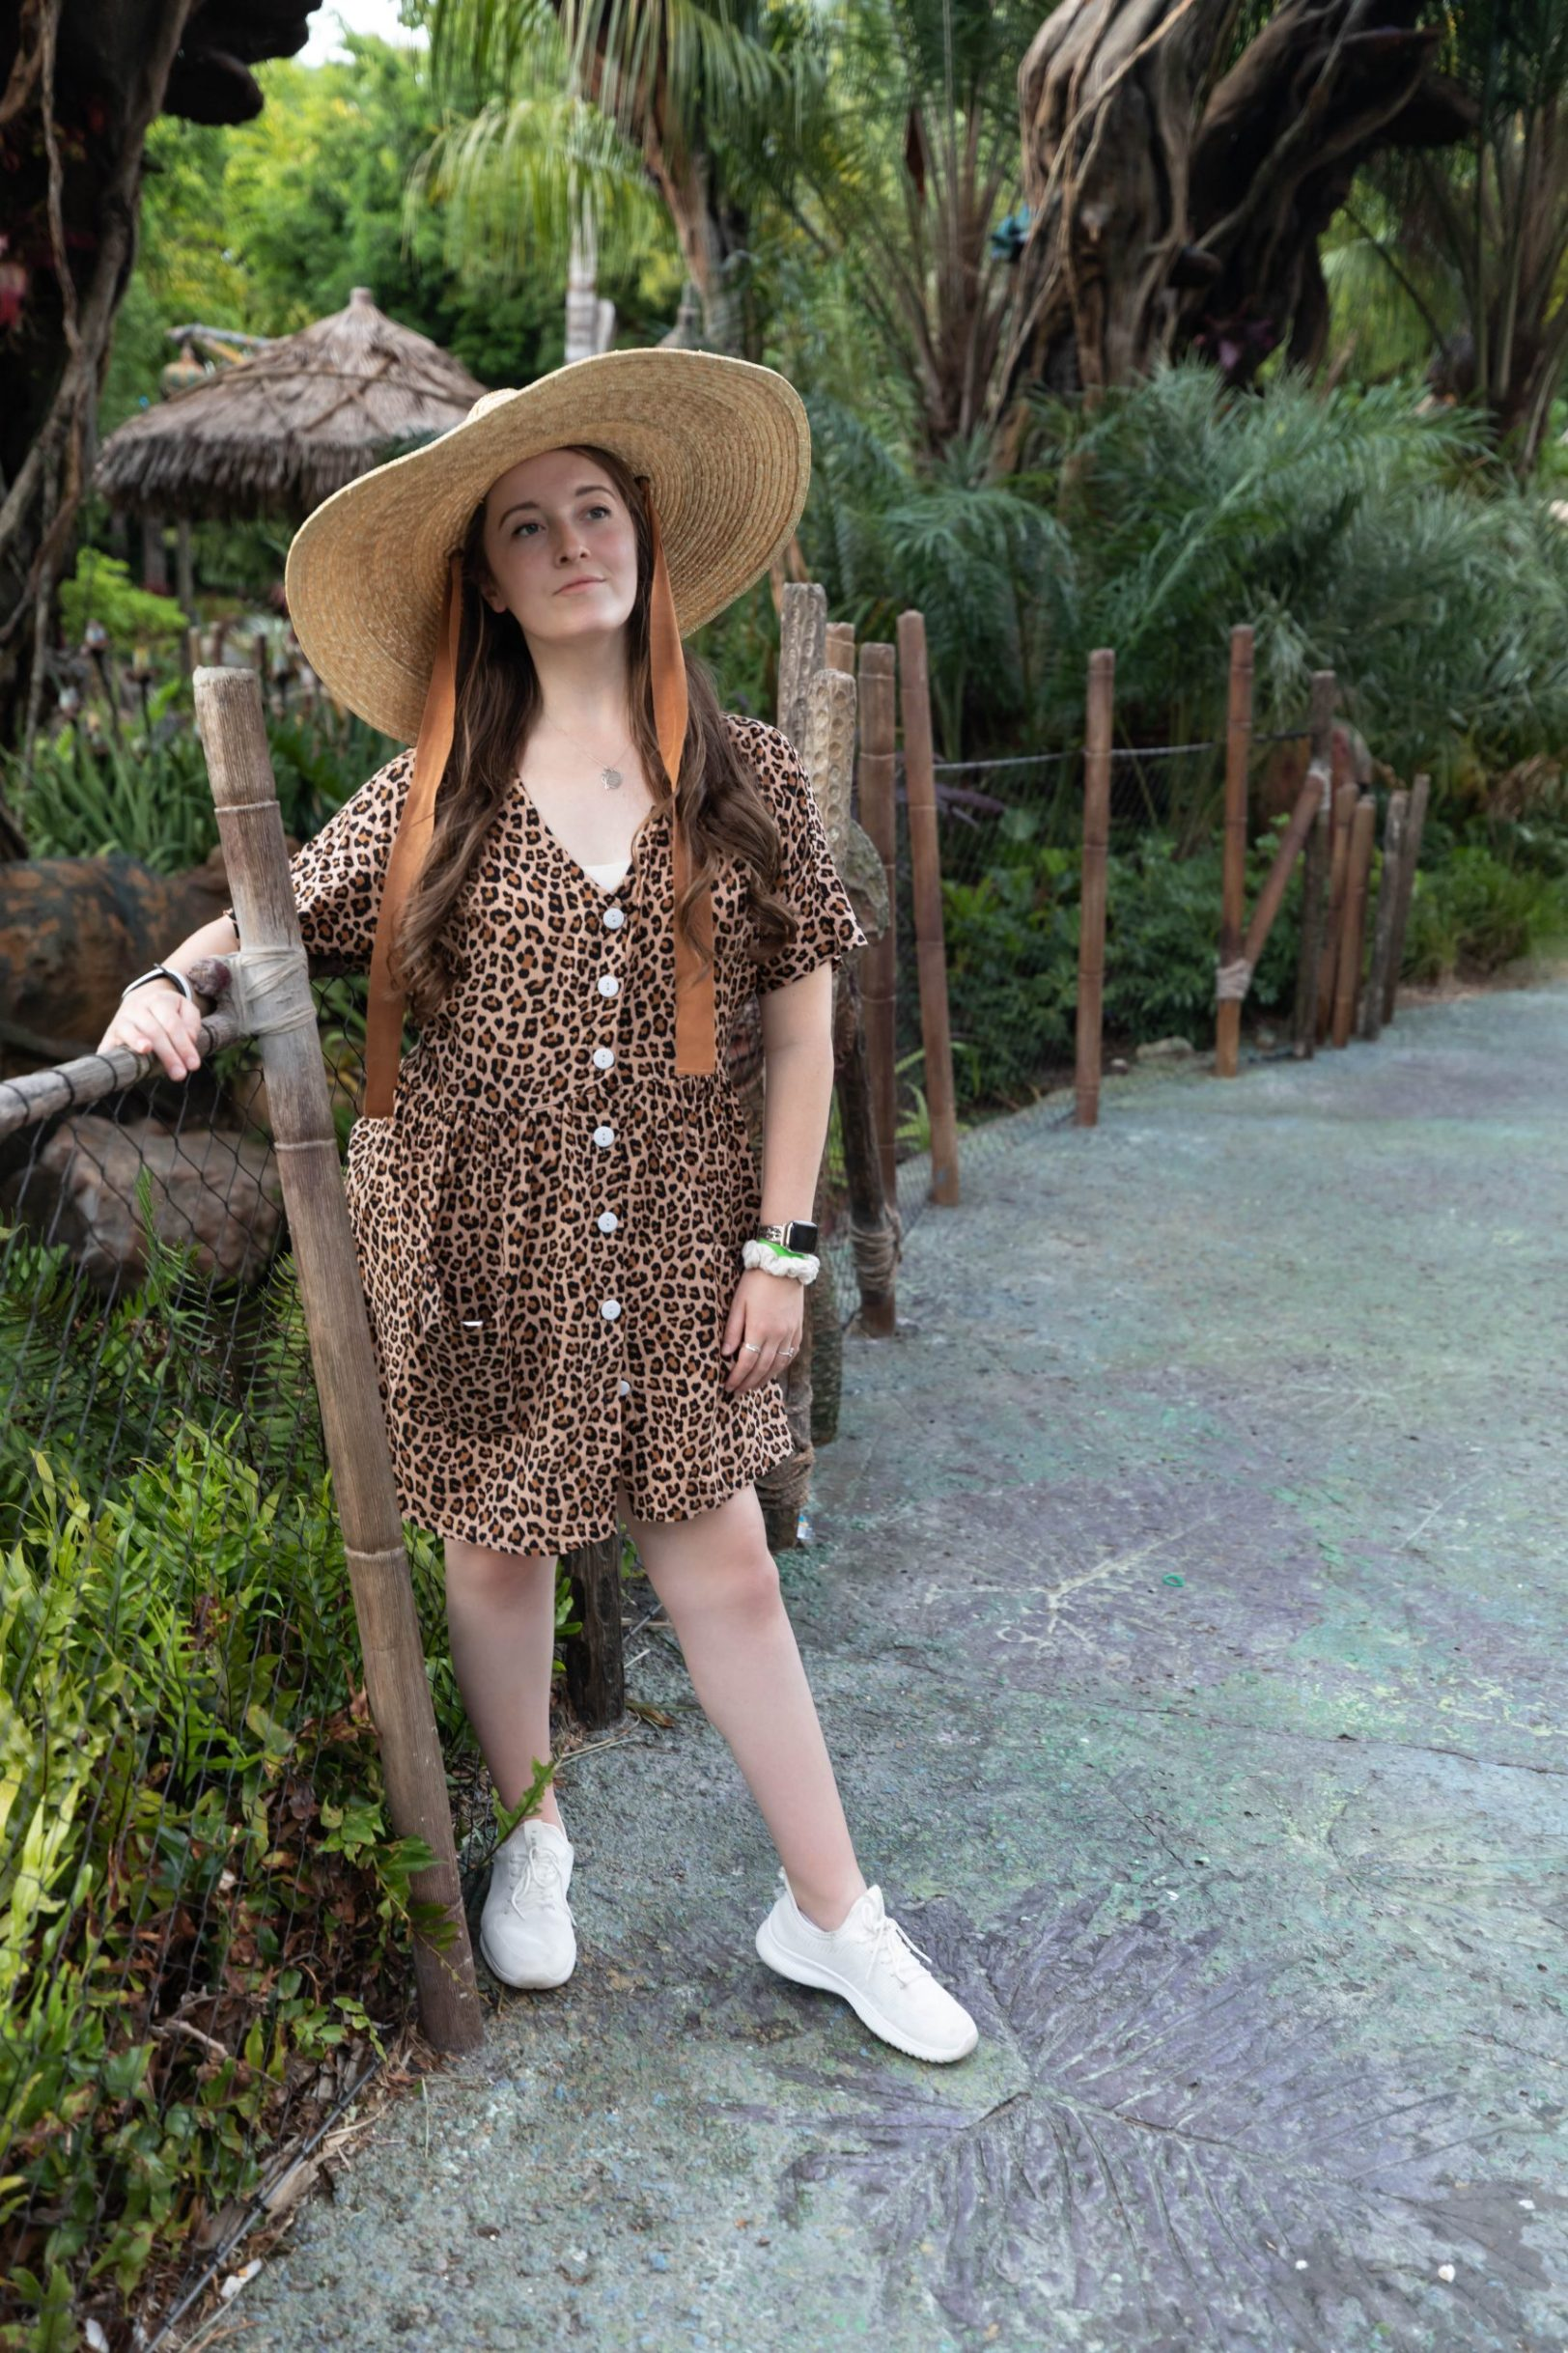 Farewell Dinner at Animal Kingdom Cheetah Print Dress